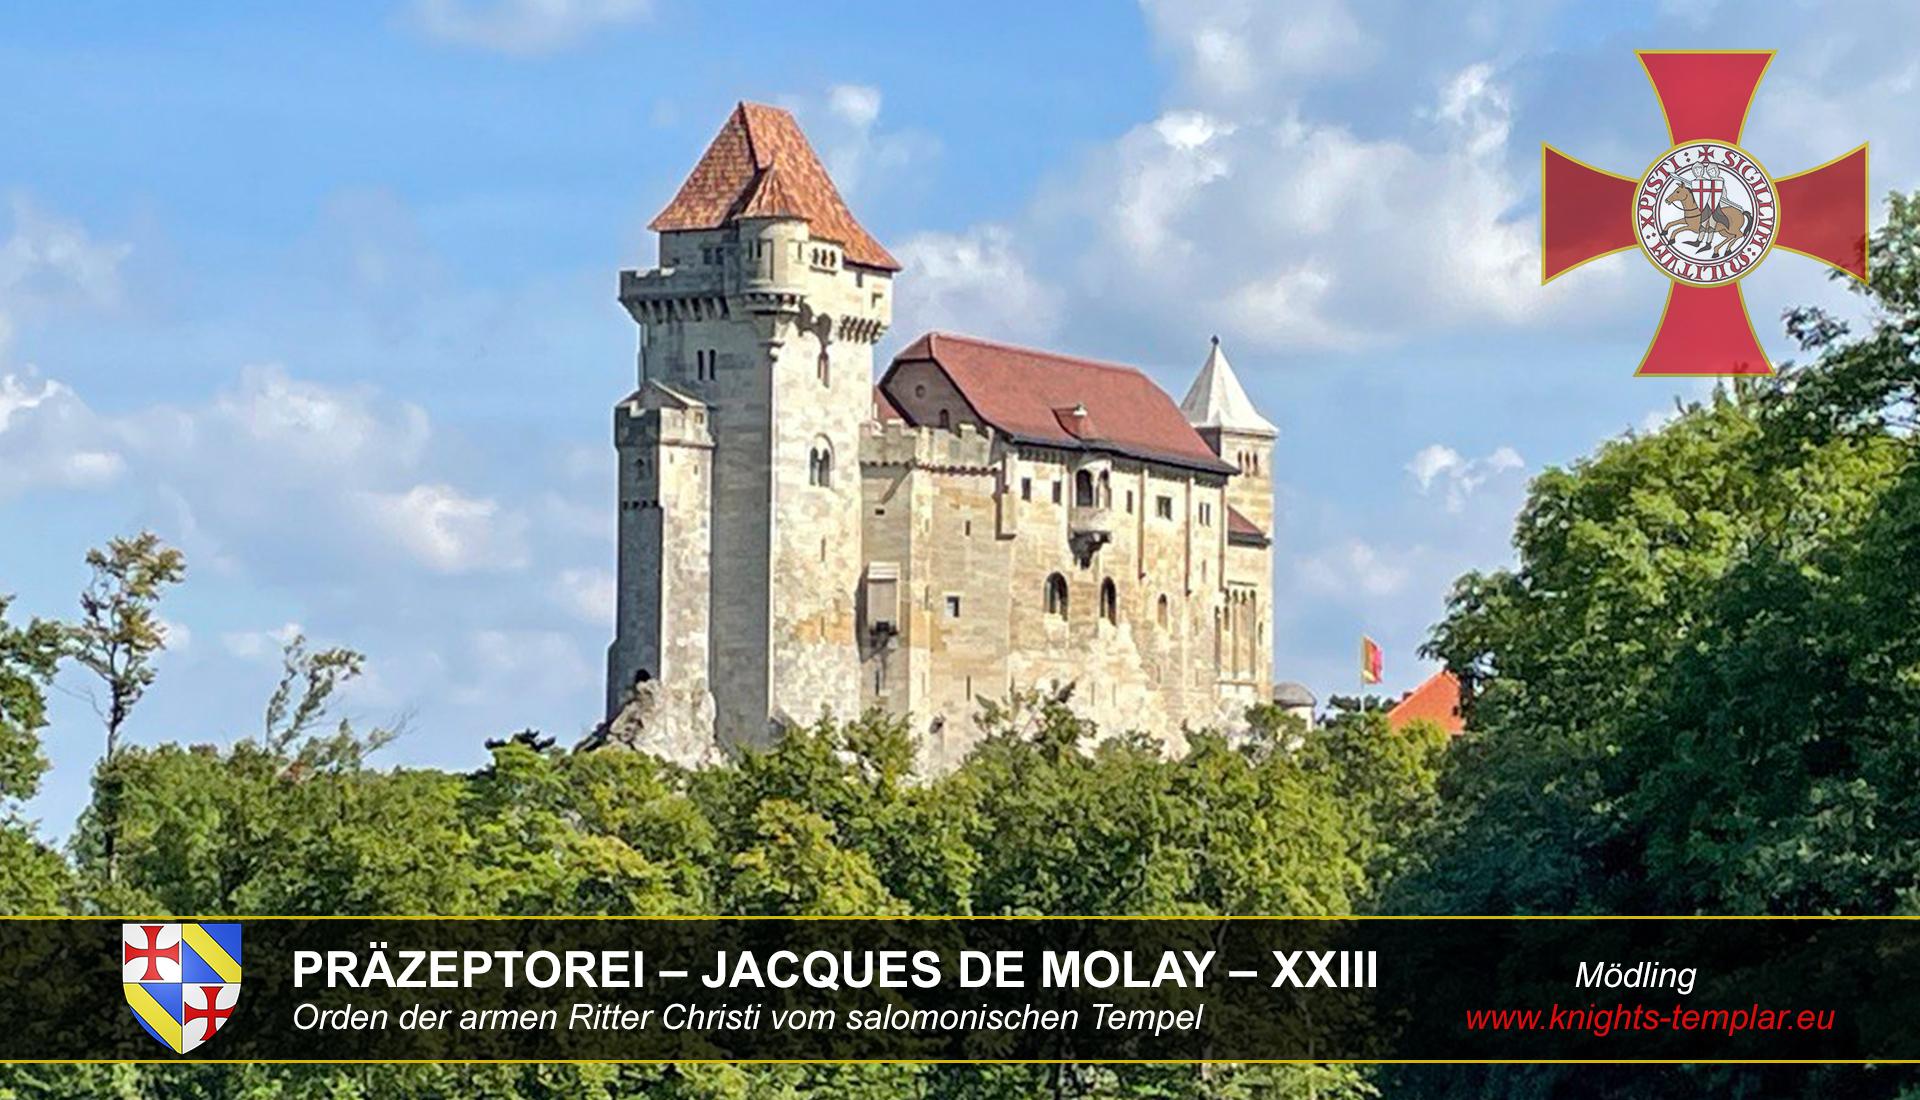 PRÄZEPTOREI – JACQUES DE MOLAY - XXIII - Burg Liechtenstein